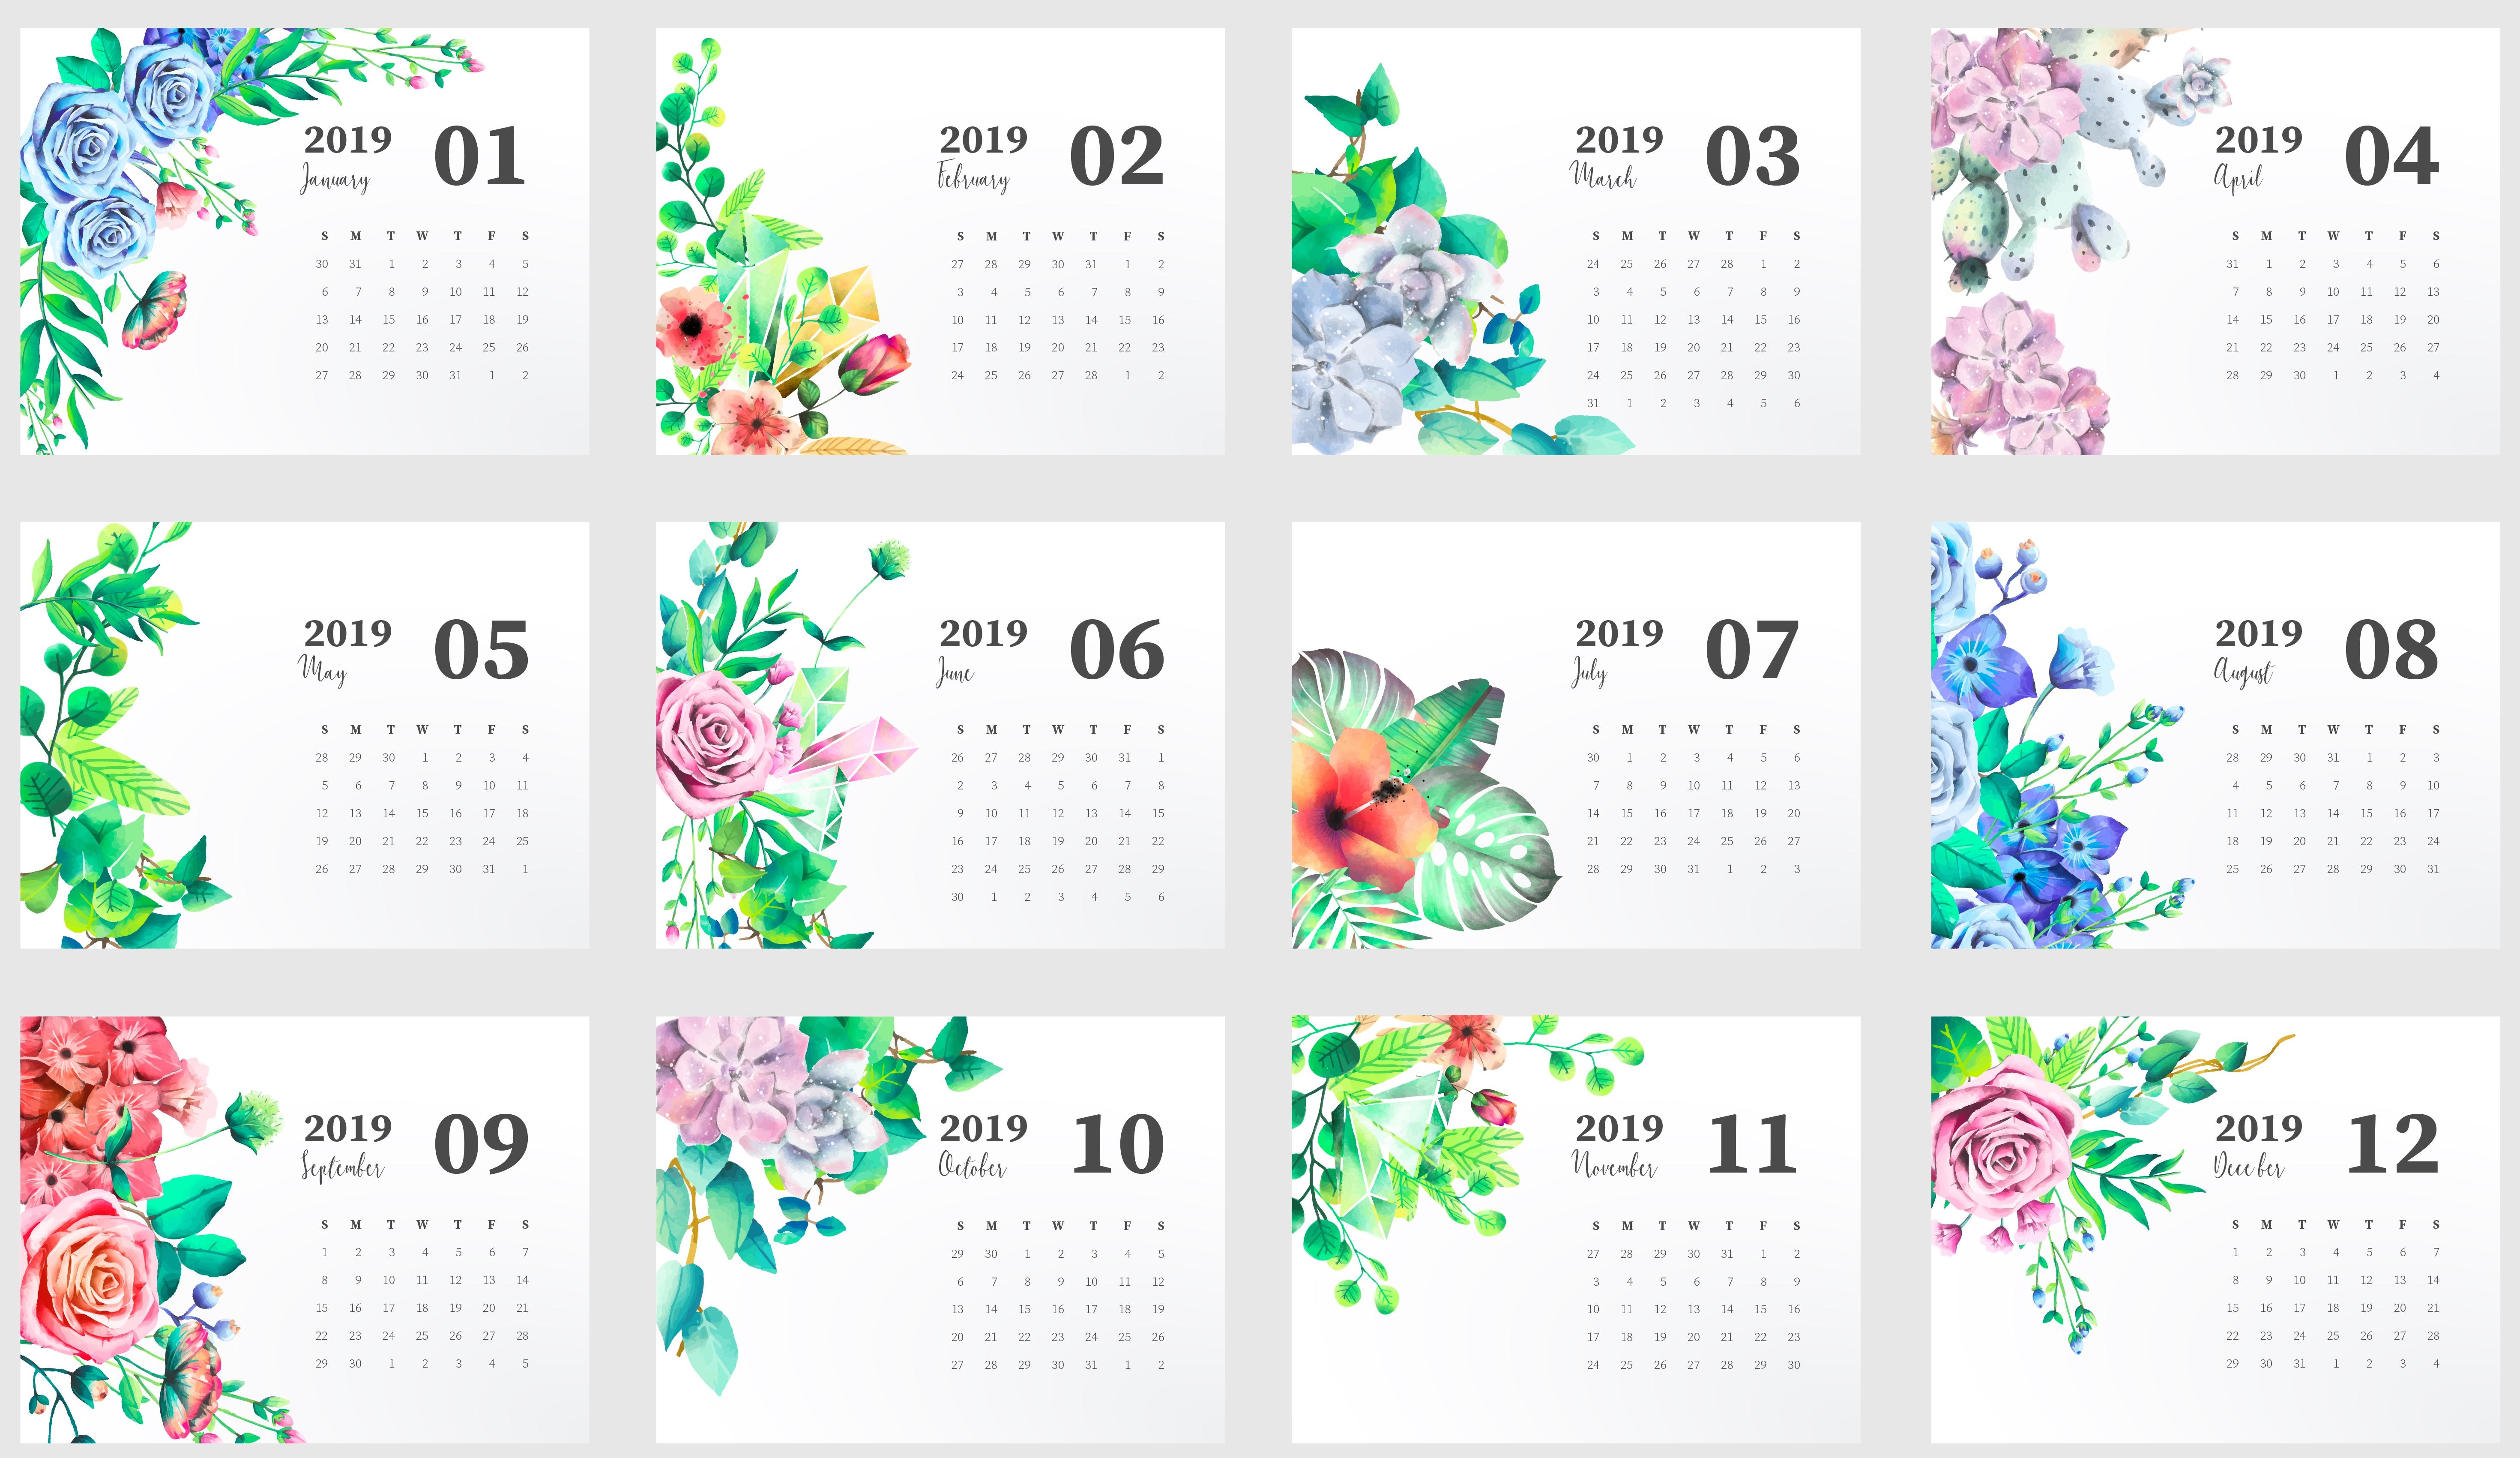 2019 Blank Yearly Calendar Template inside Cute Yearly Calendar Template